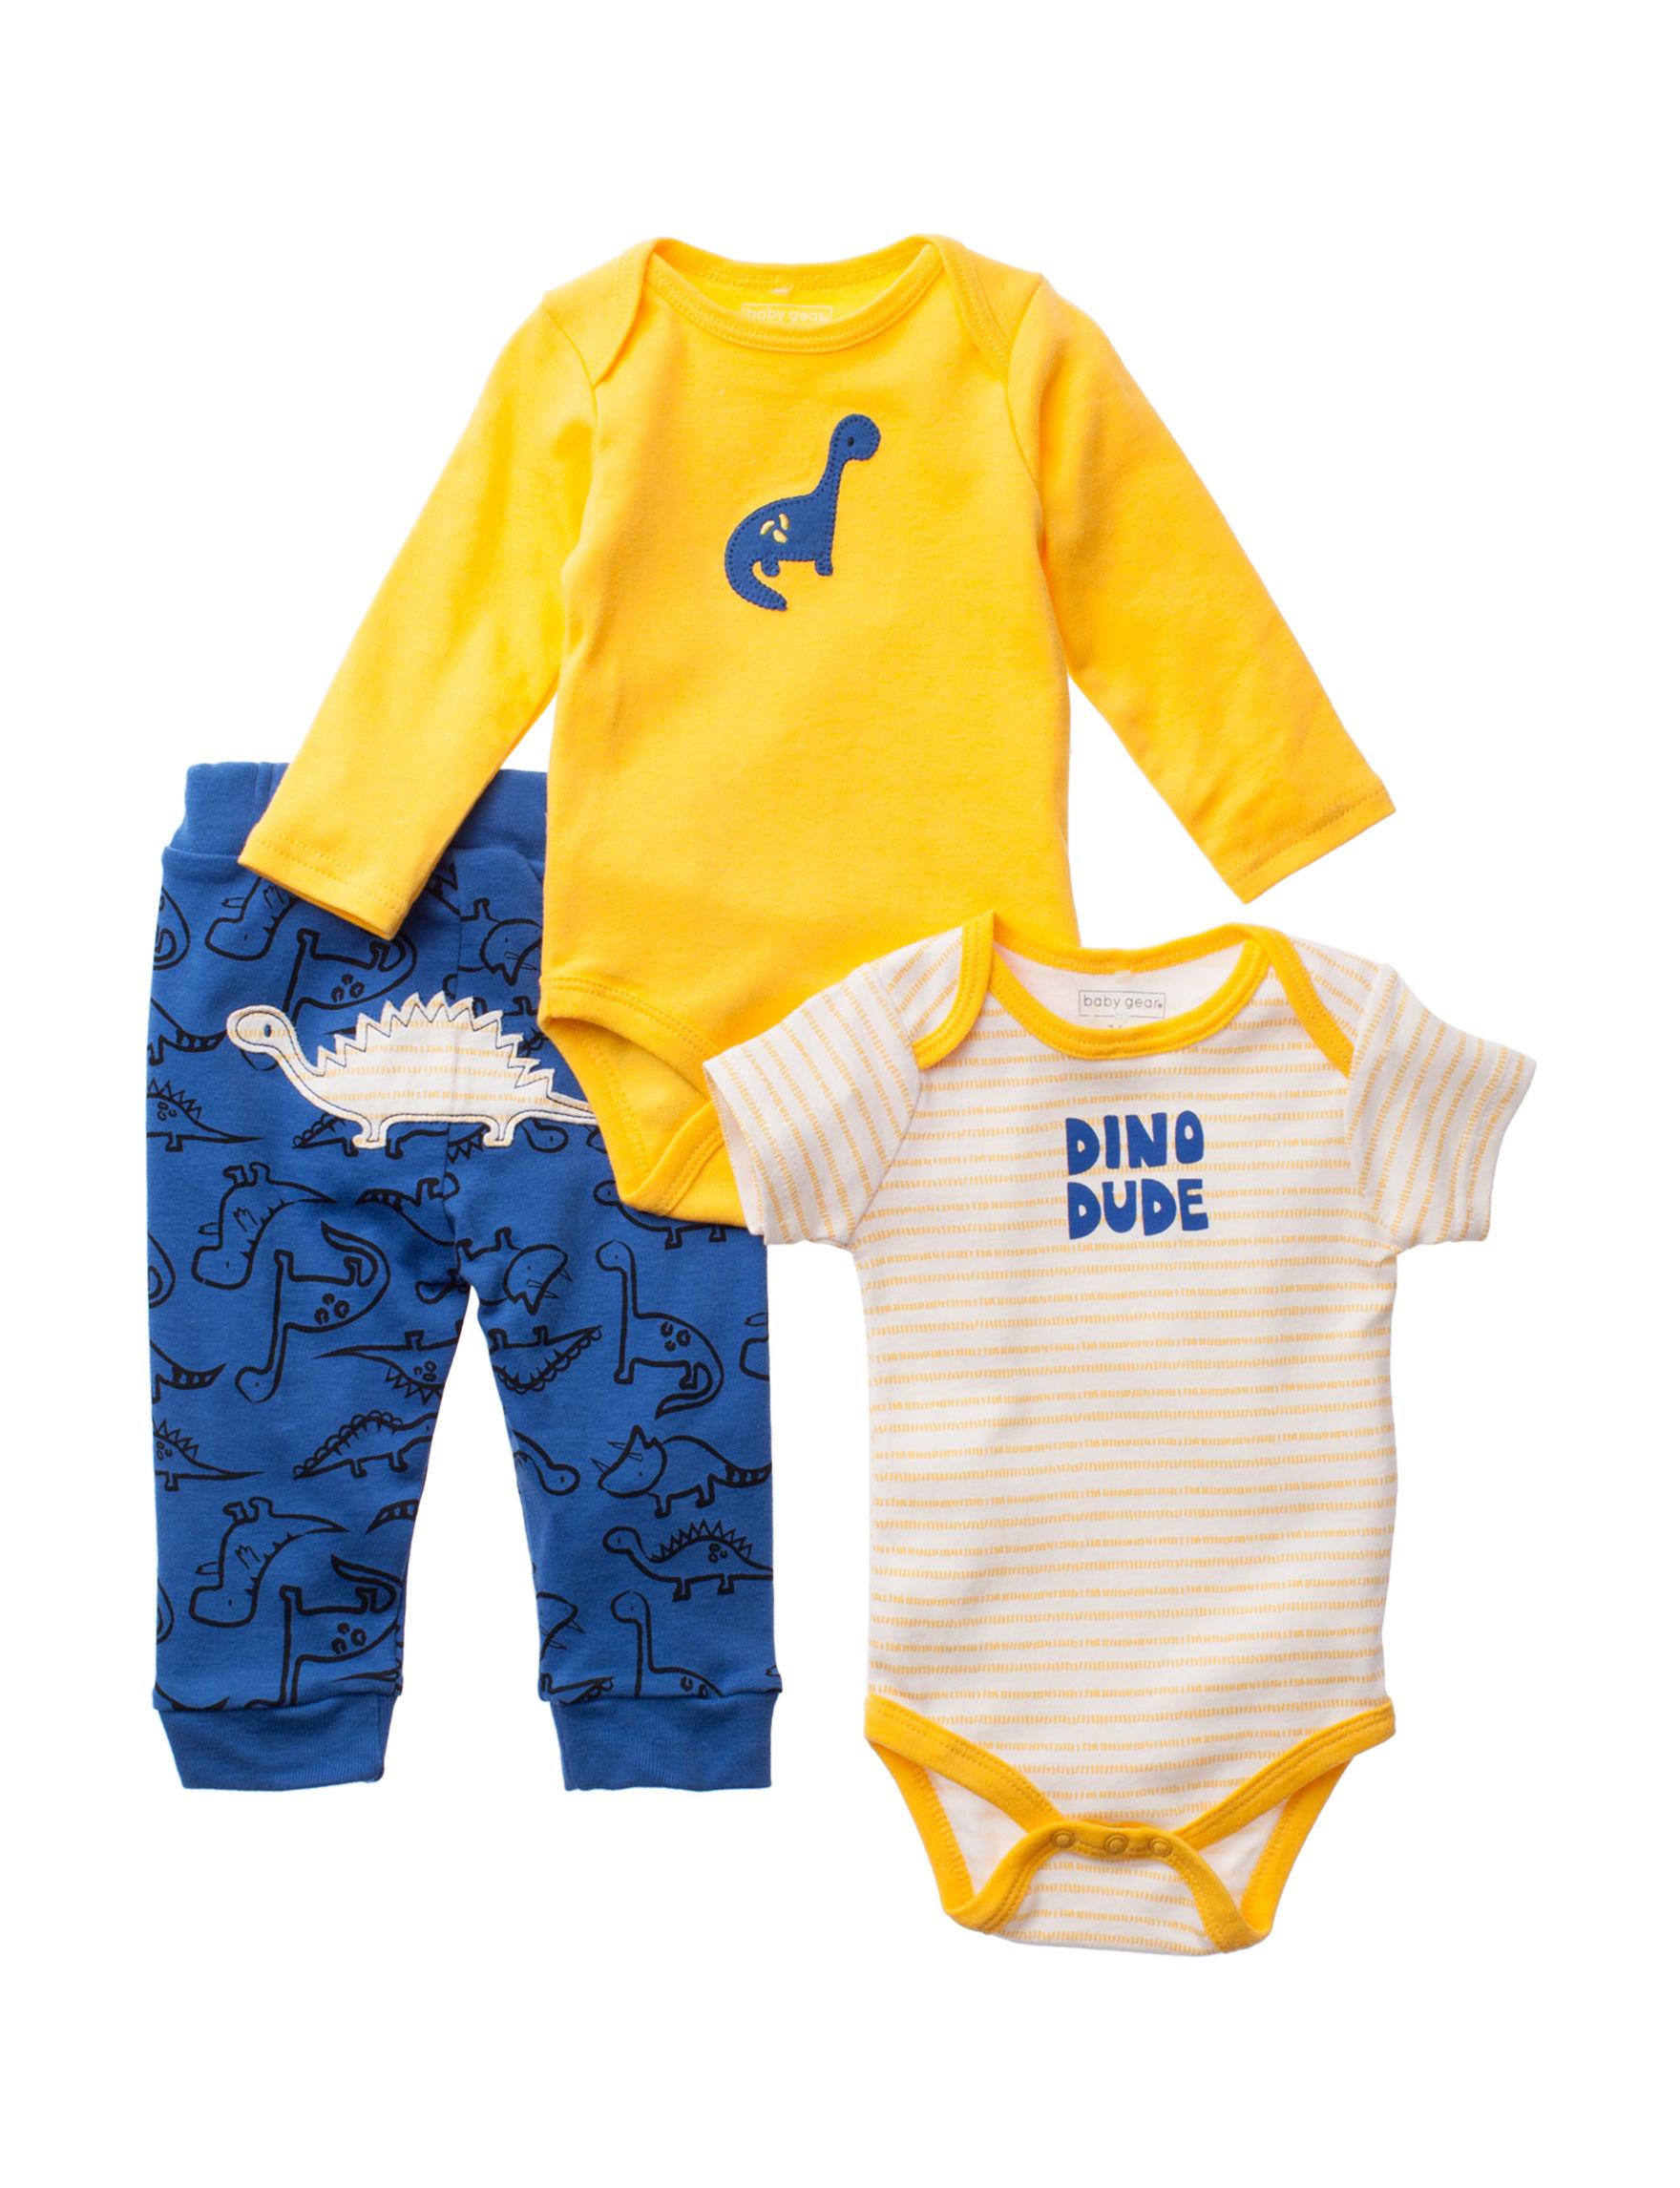 Baby Gear Yellow / Blue